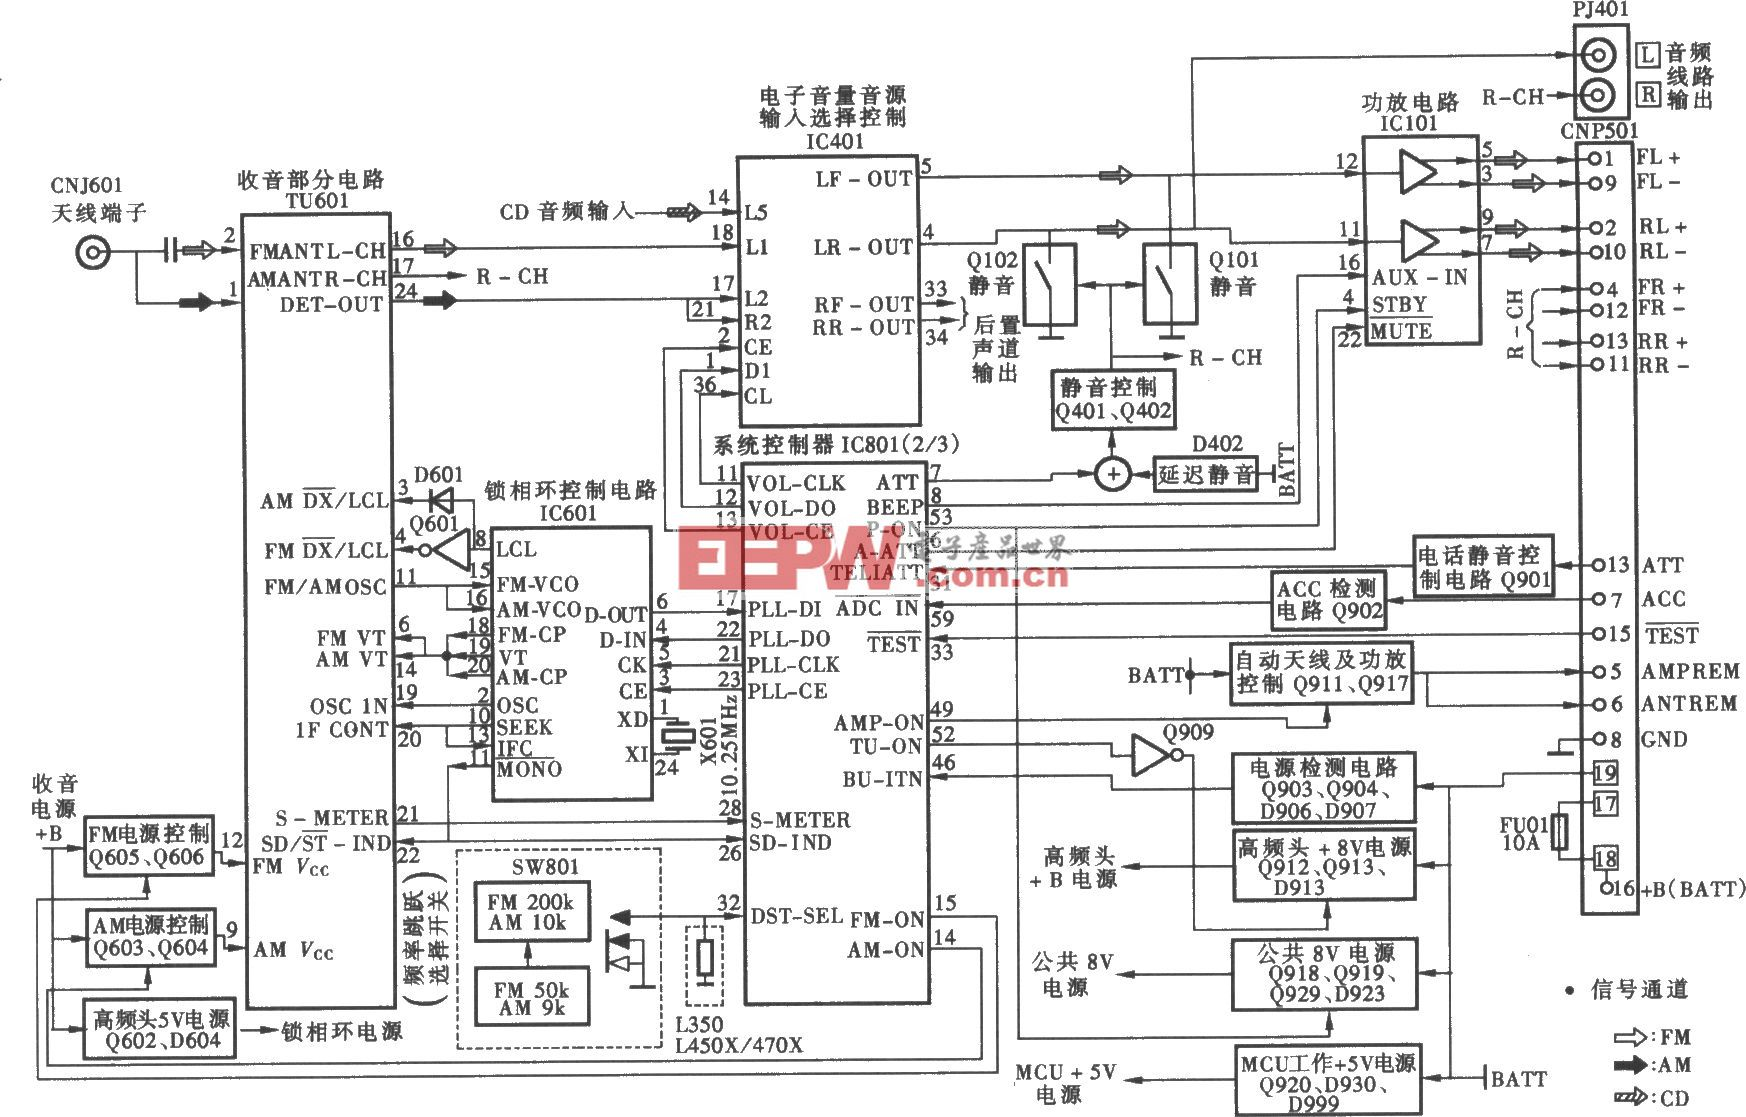 SONY CDX-LA70X型汽车音响收音高频头与音频放大电路